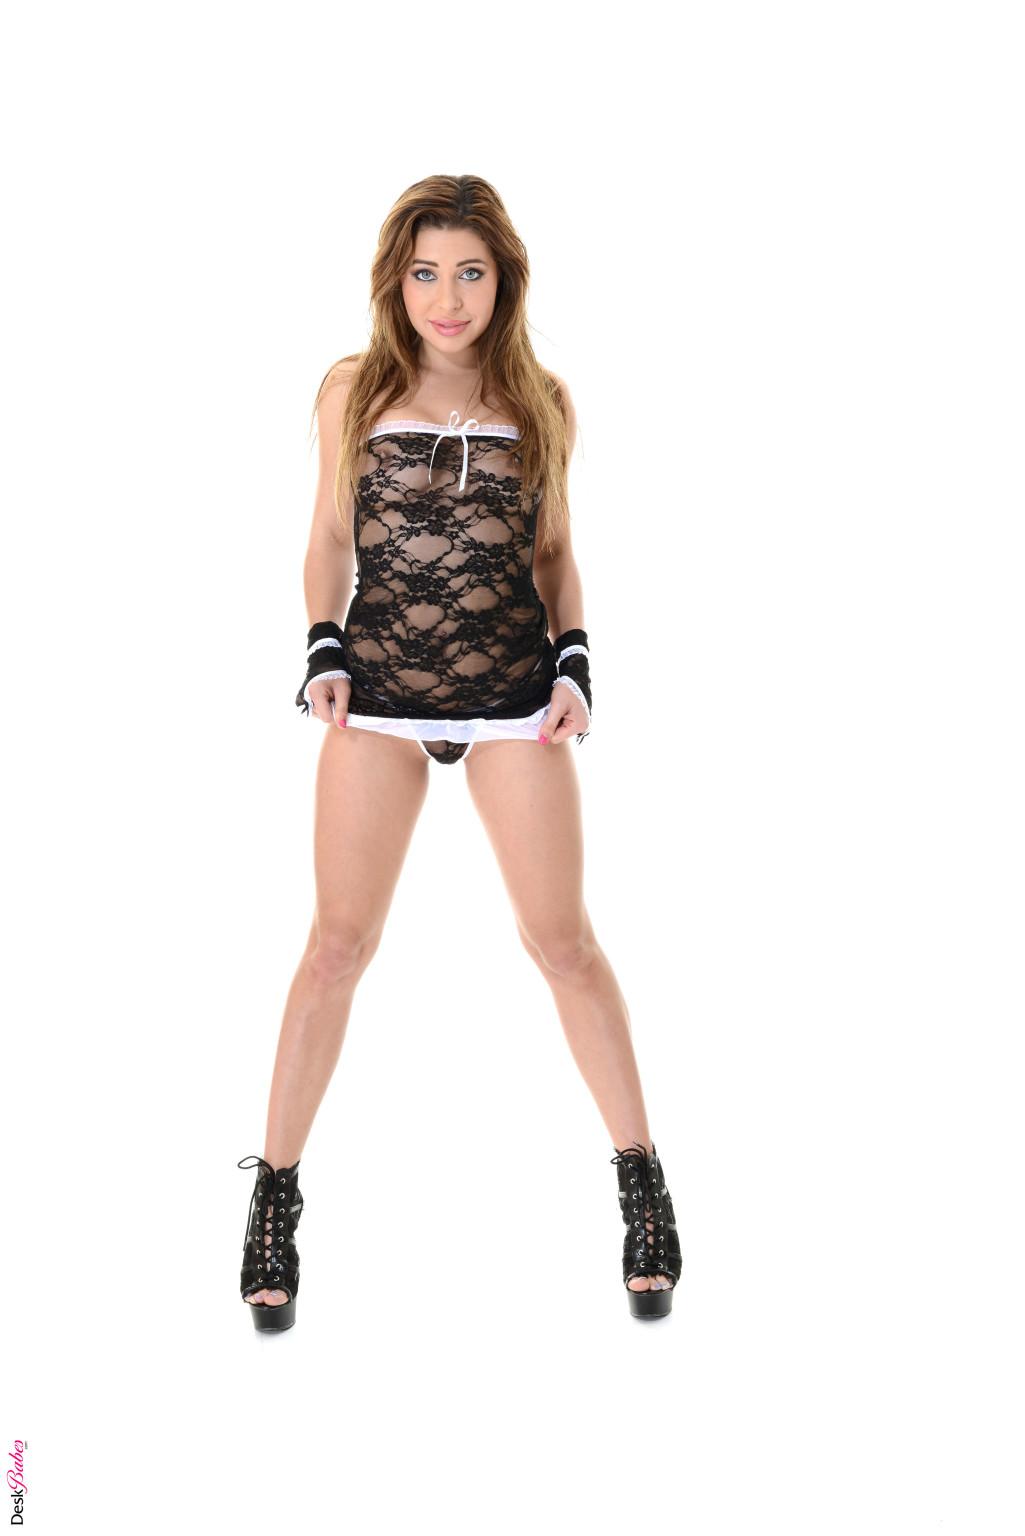 Ally Breelsen - Секс игрушки - Порно галерея № 3508558